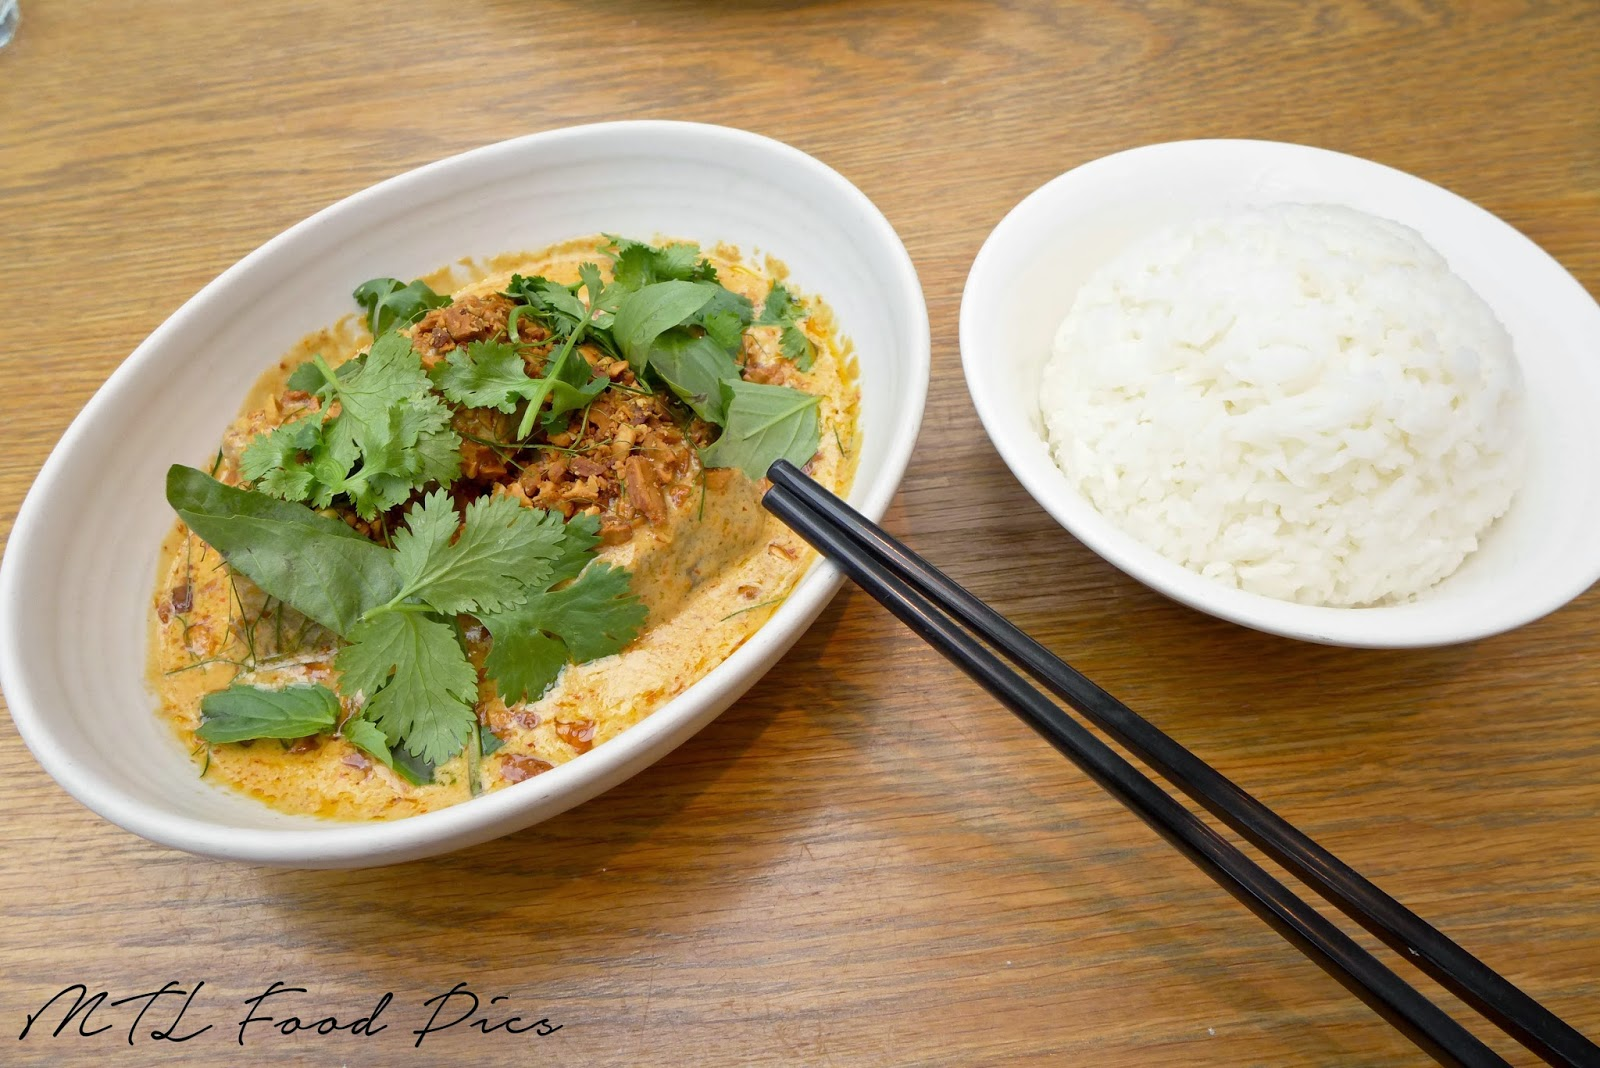 Braised Beef Short Ribs with Jasmine Rice - Thai food Ottawa